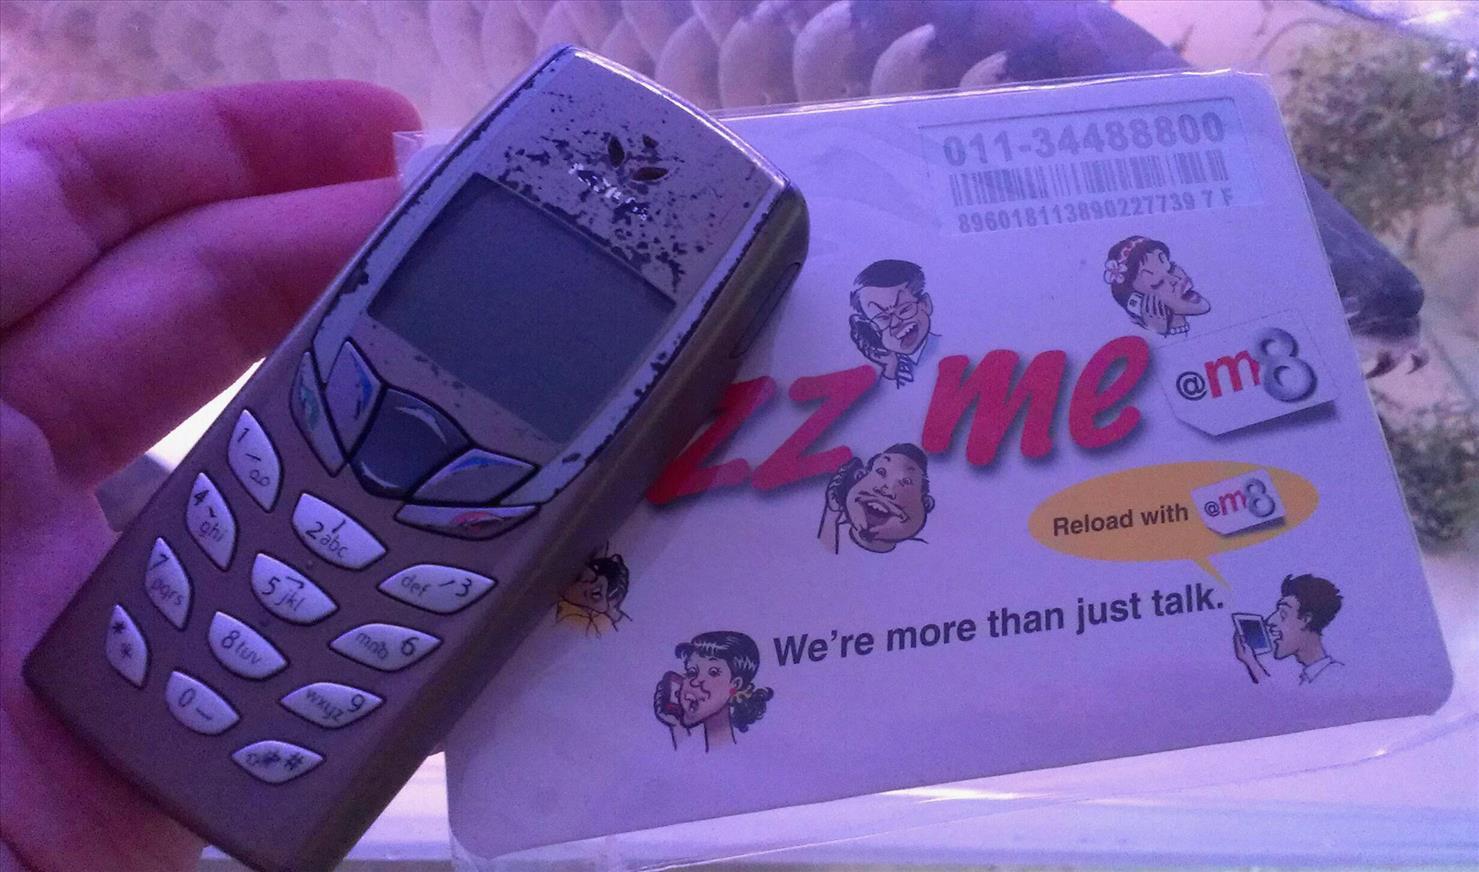 cheaper 85619 1b40e Original Nokia 6510 vintage - 3310 3210 8210 8310 8250 8850 vip number